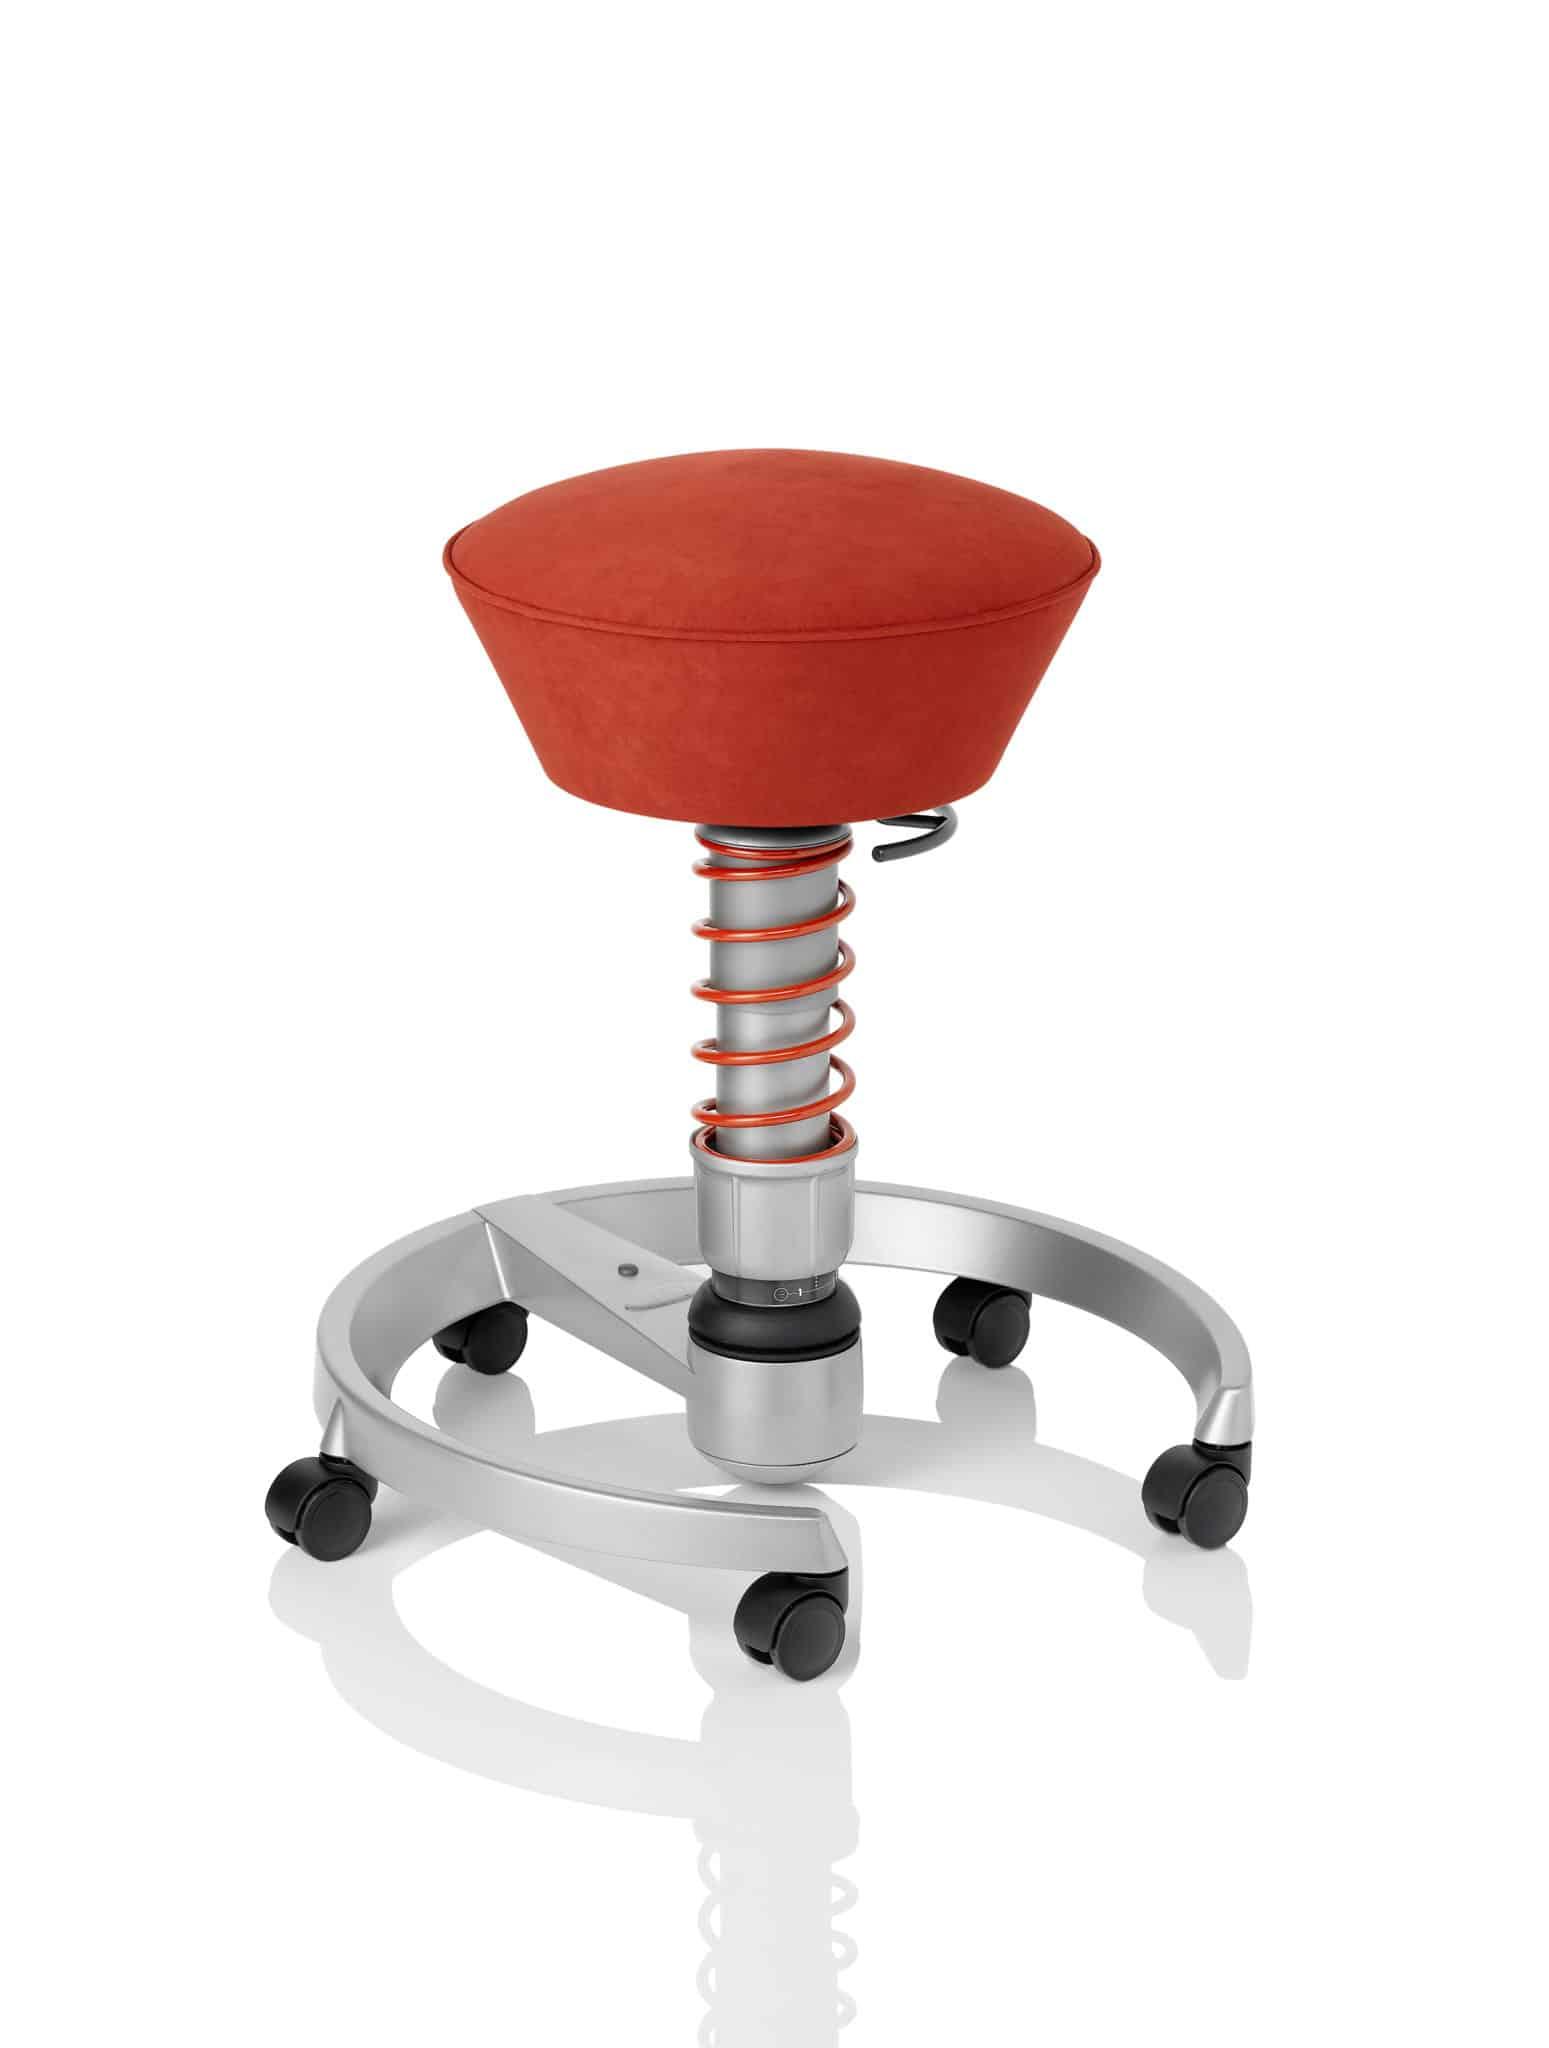 01 swopper titan ferraro red rollers. Black Bedroom Furniture Sets. Home Design Ideas